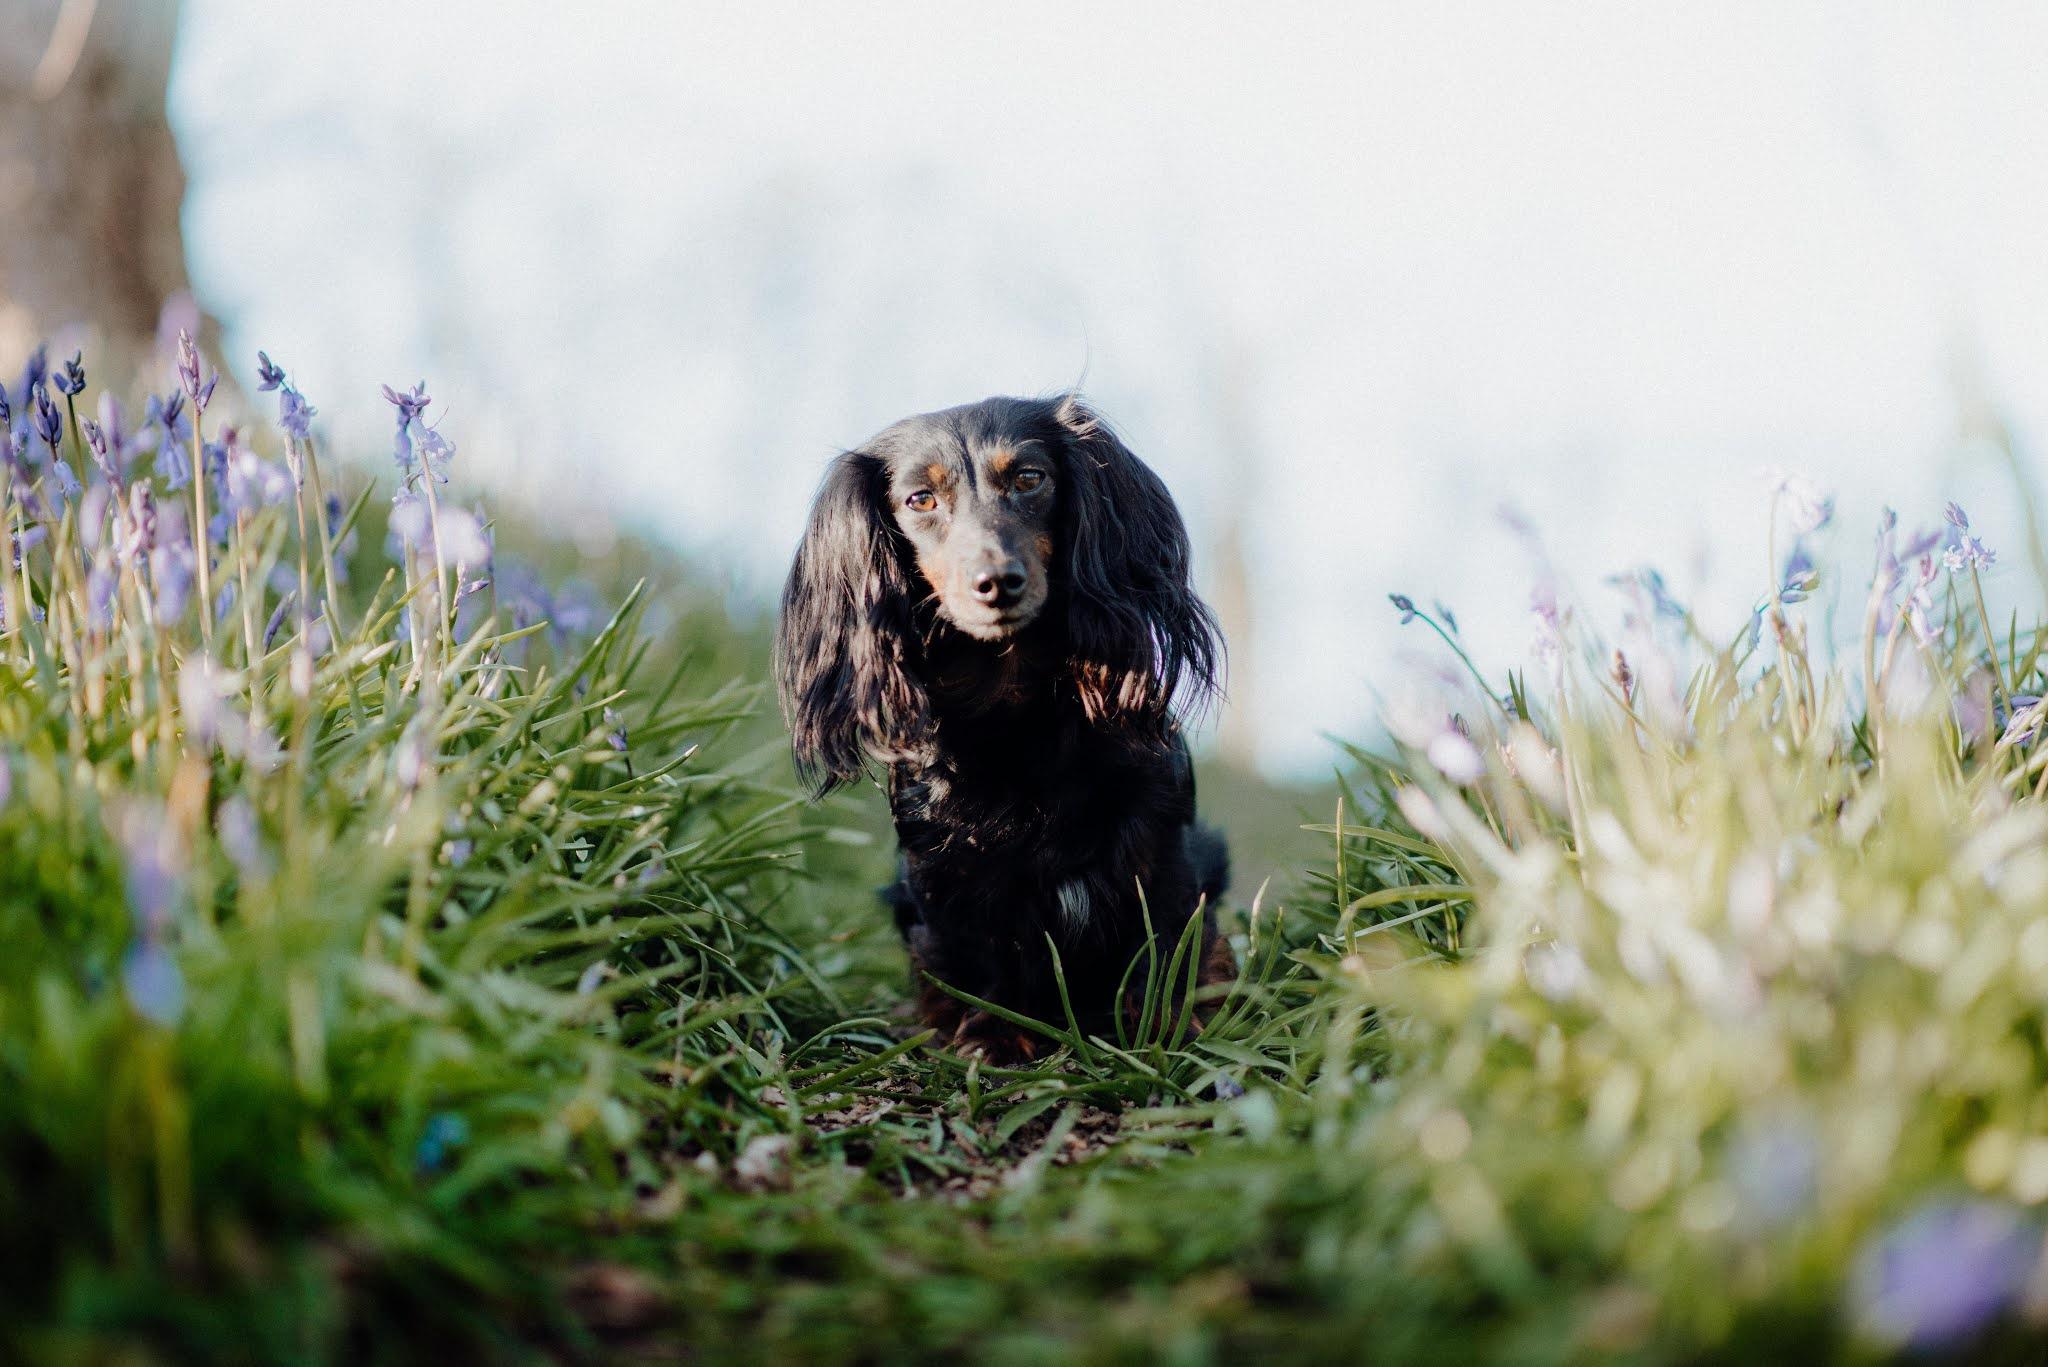 dachshund in bluebells liquid grain scotland